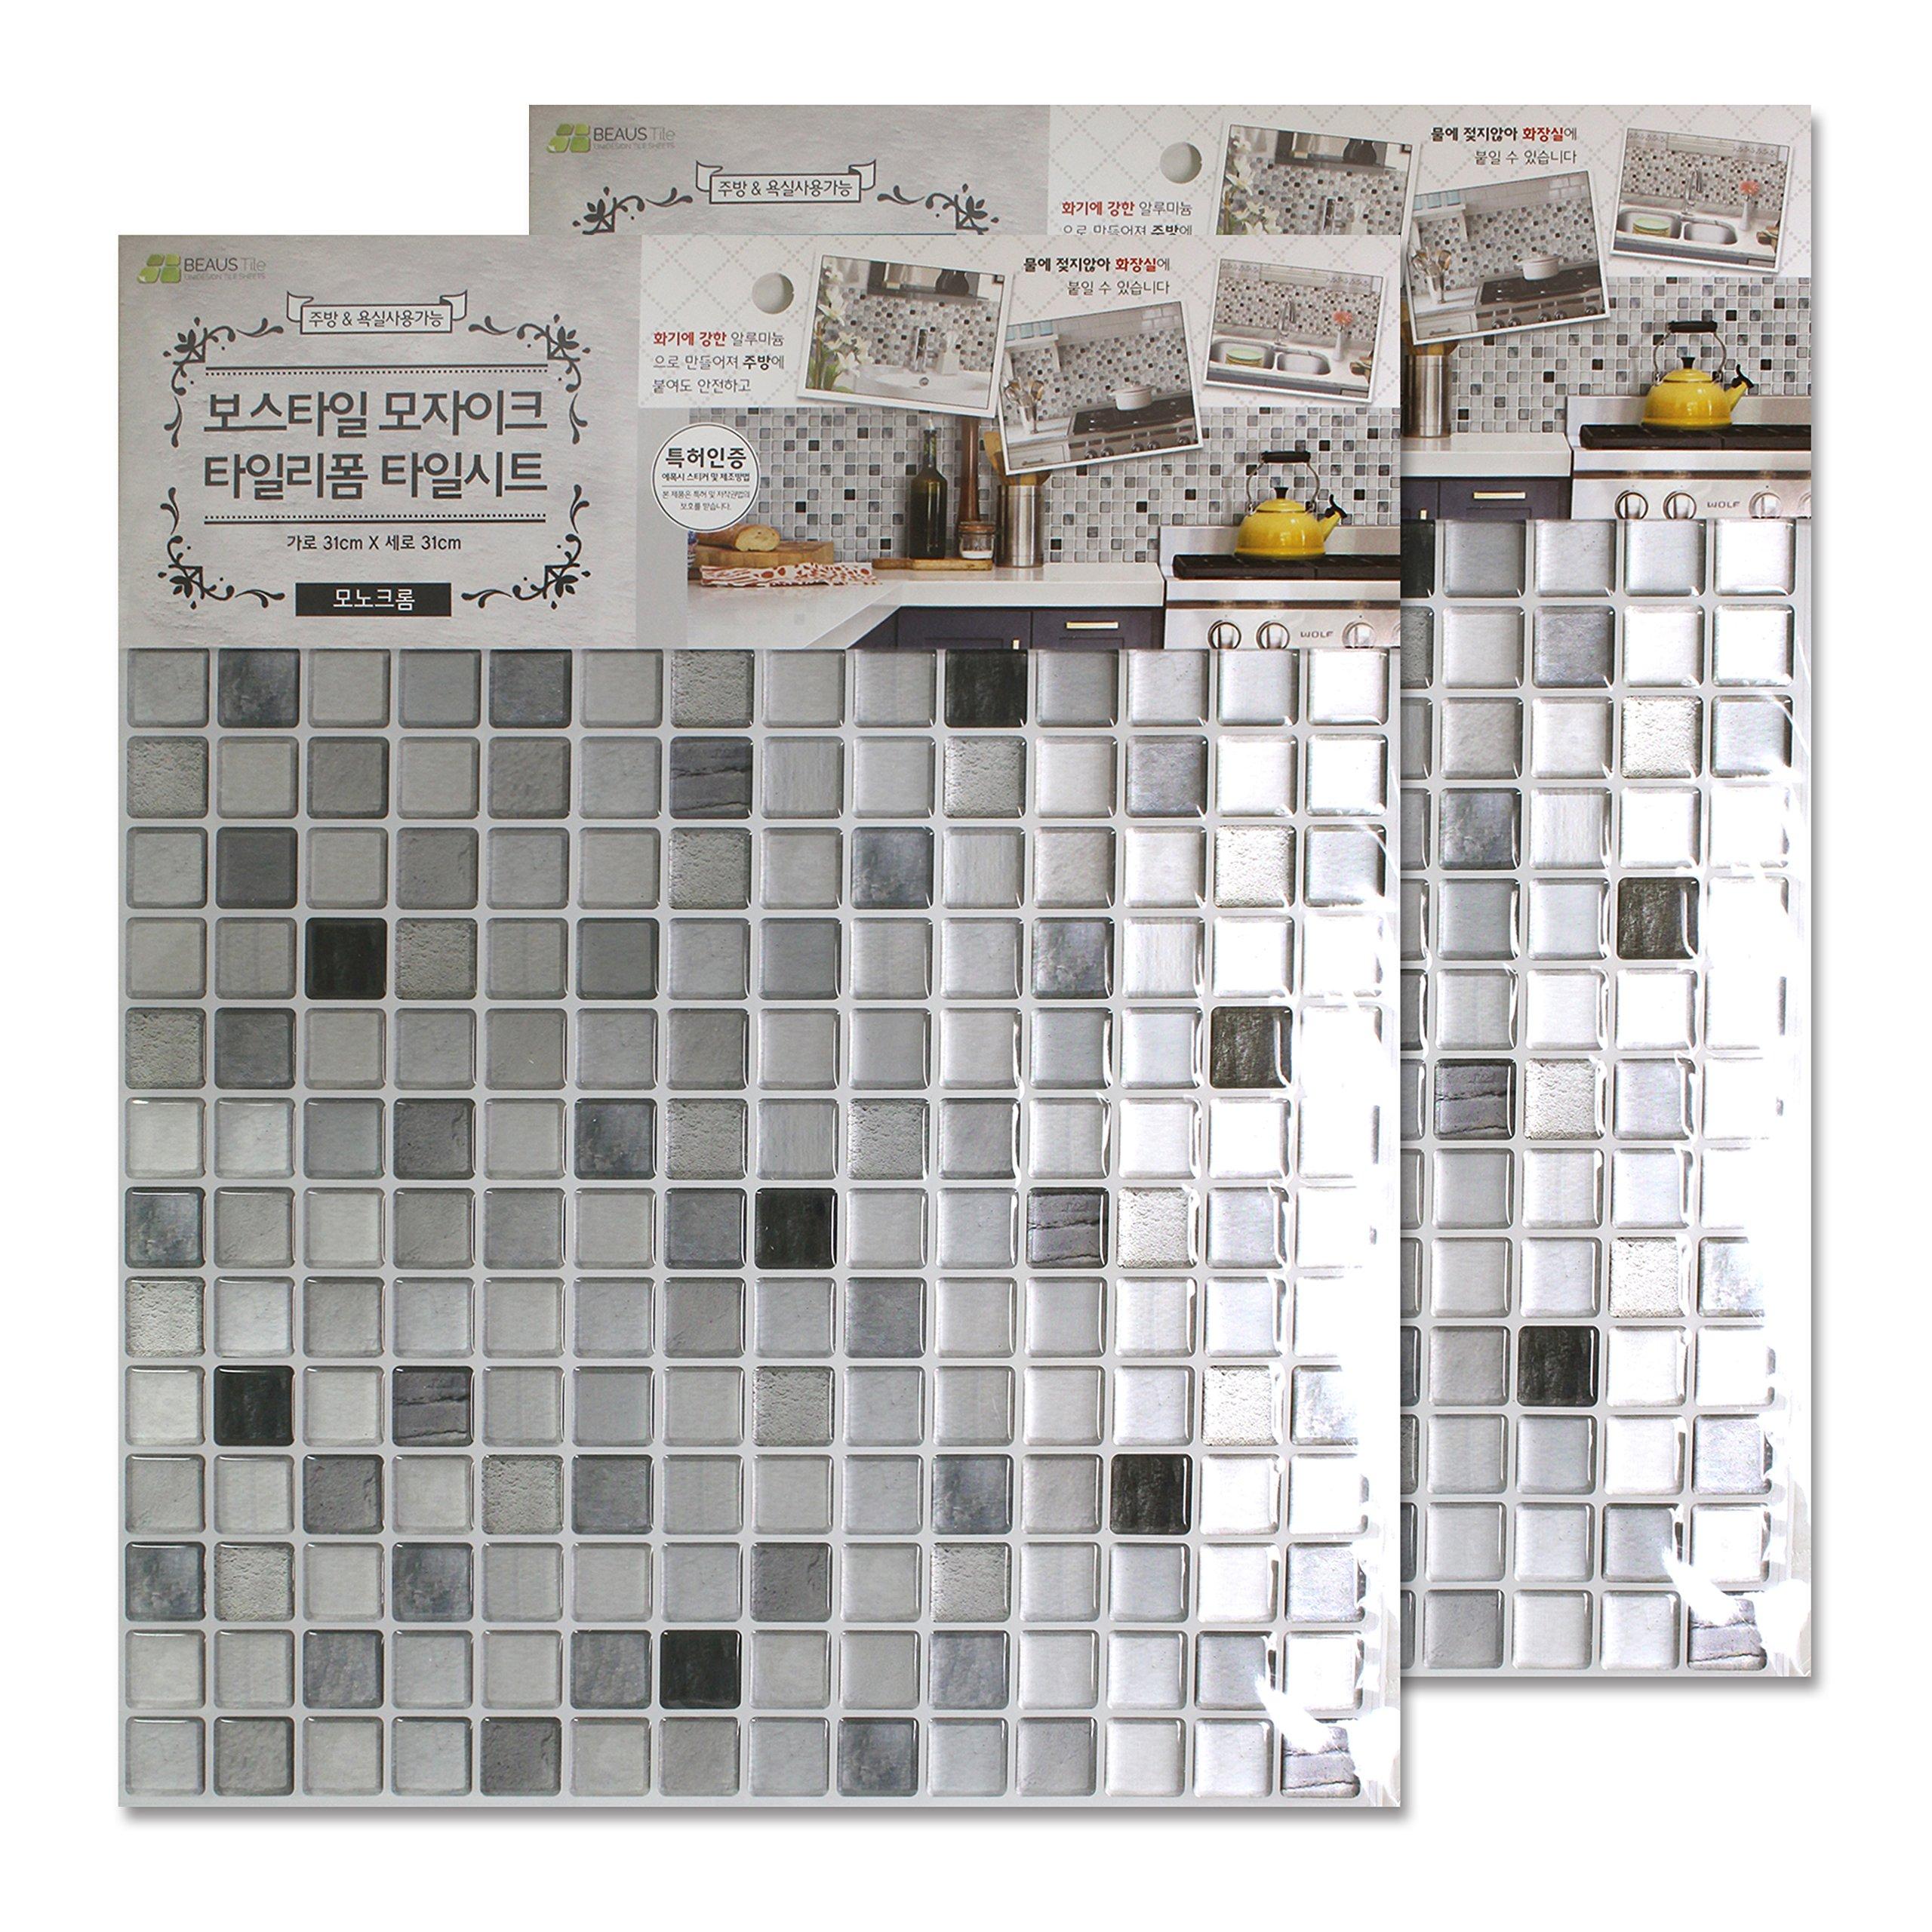 BEAUSTILE Decorative Tile Stickers Peel Stick Backsplash Fire Retardant Tile Sheet (Monocrome) (10, 12.2'' x 12.2'') by BEAUS TILE (Image #6)